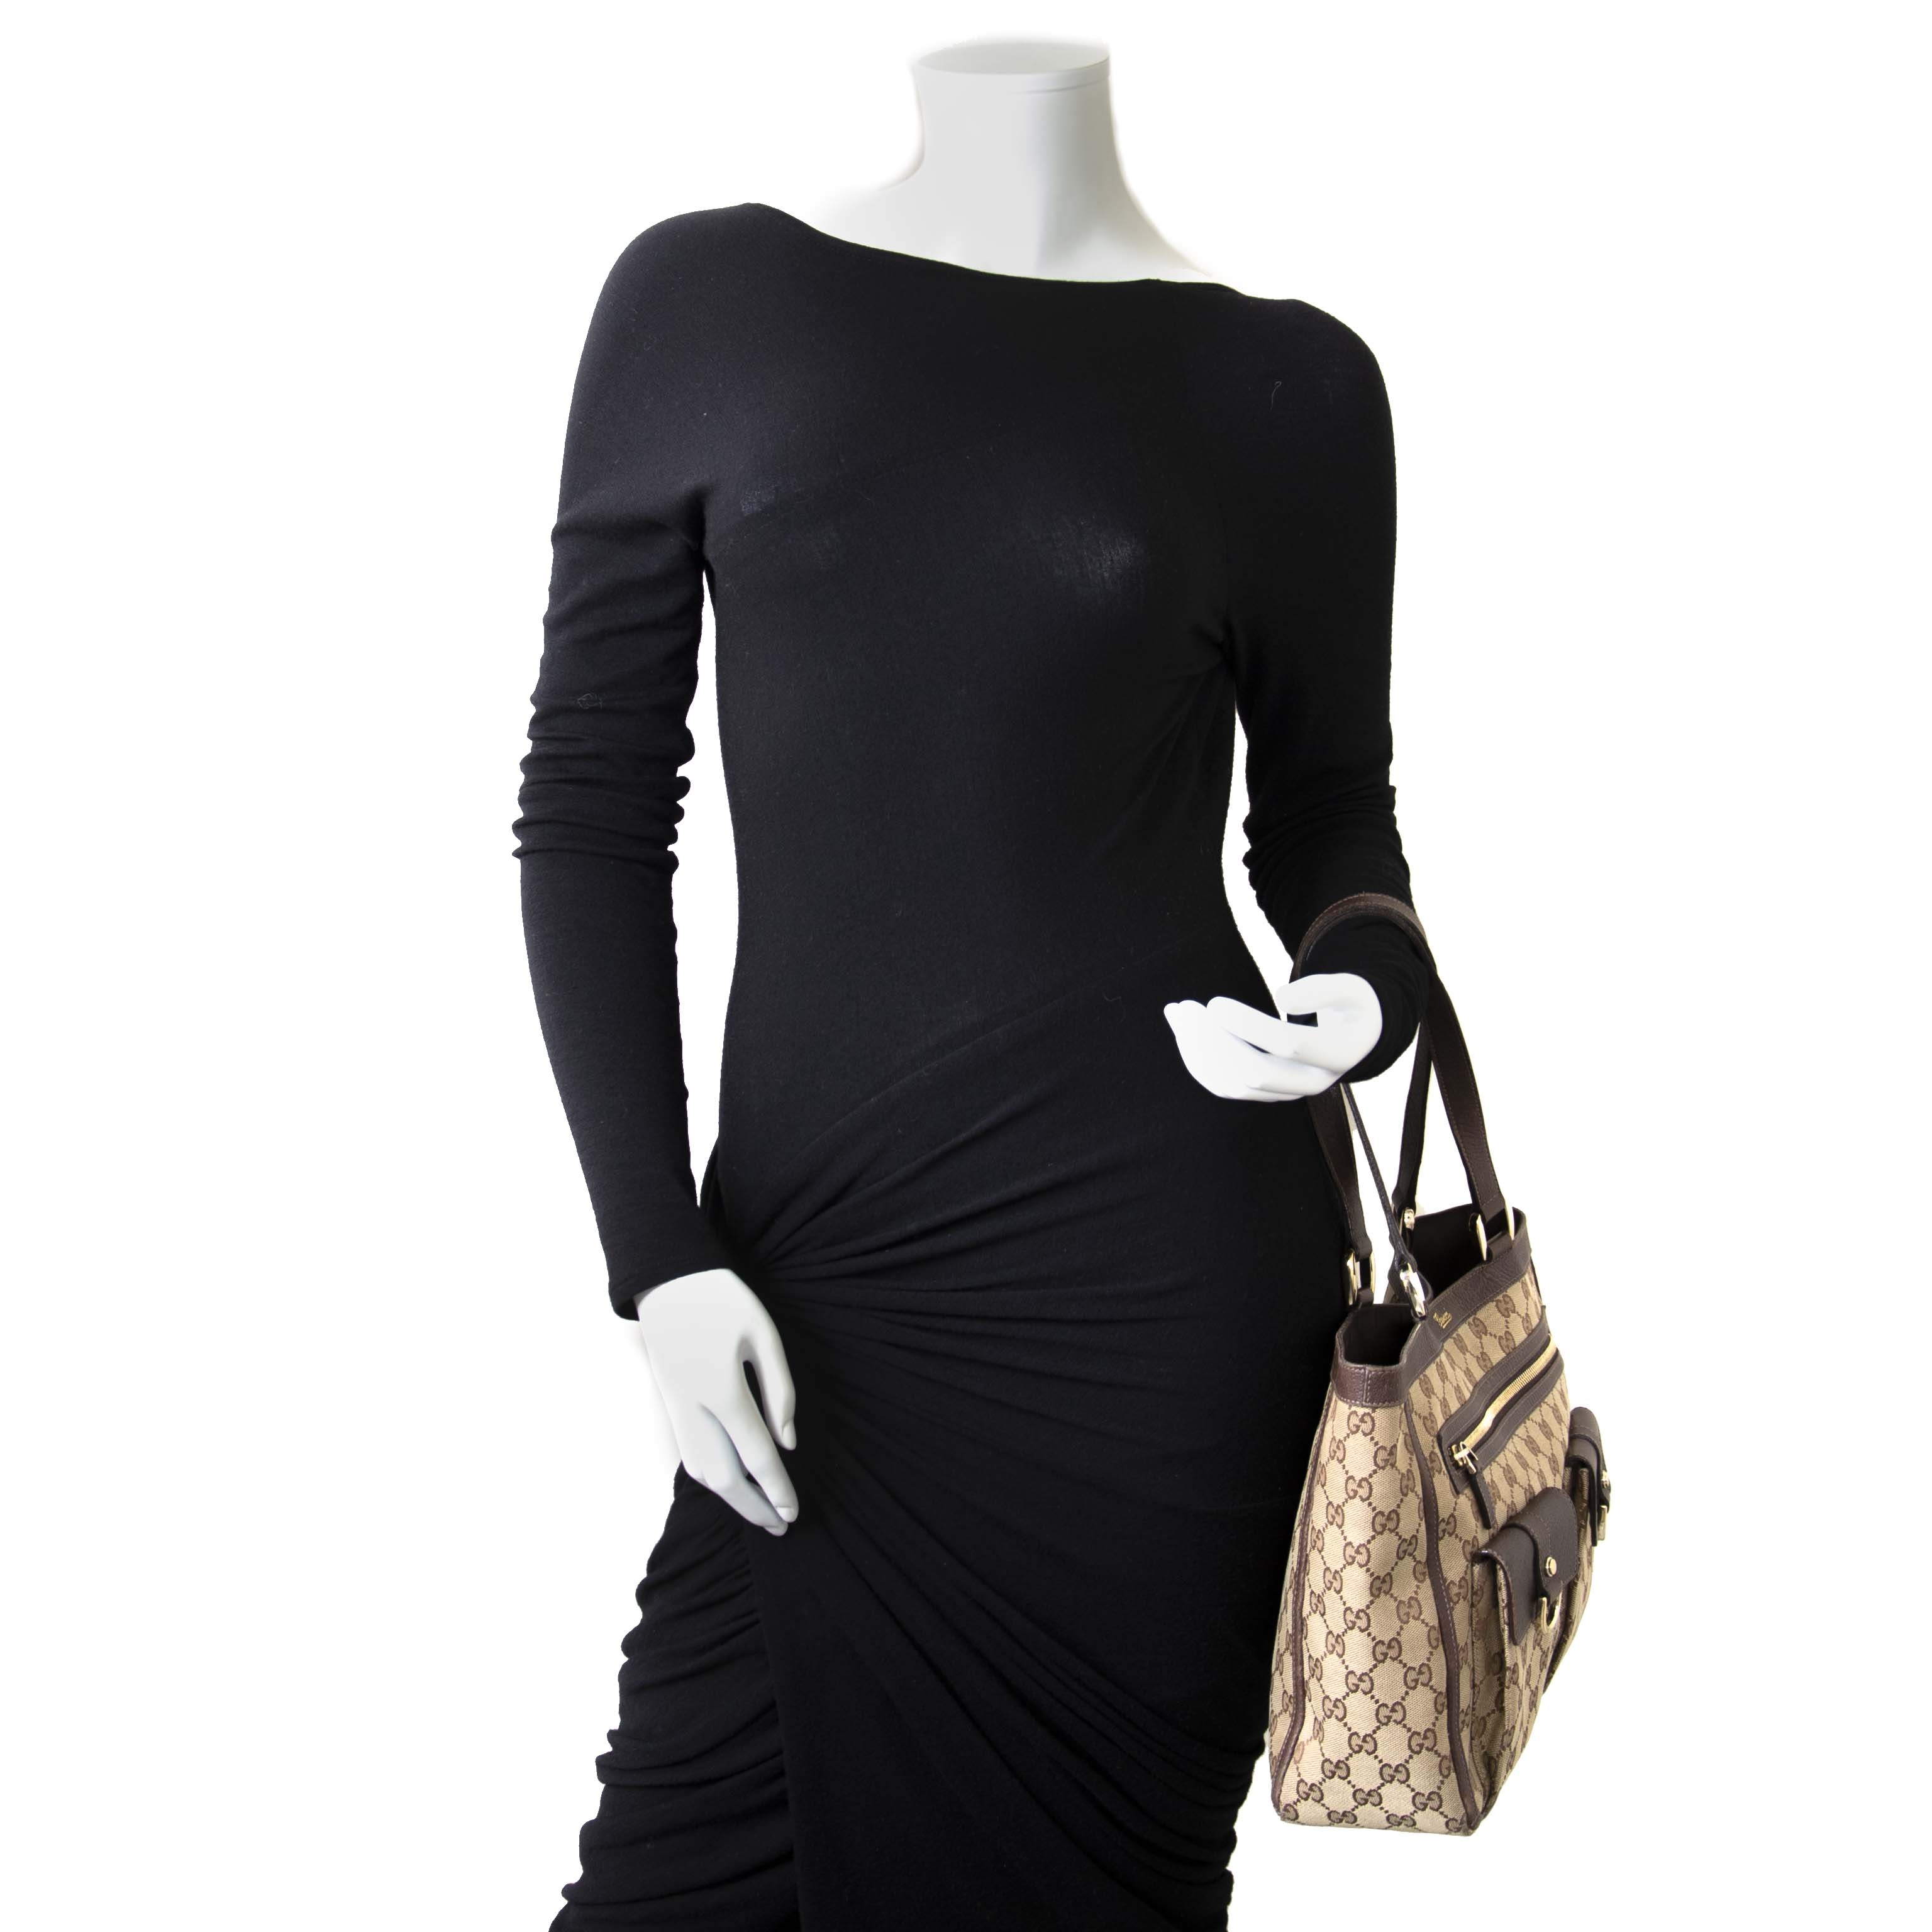 gucci monogram abbey tas nu te koop bij labellov vintage mode webshop belgië aan de laagste prijs